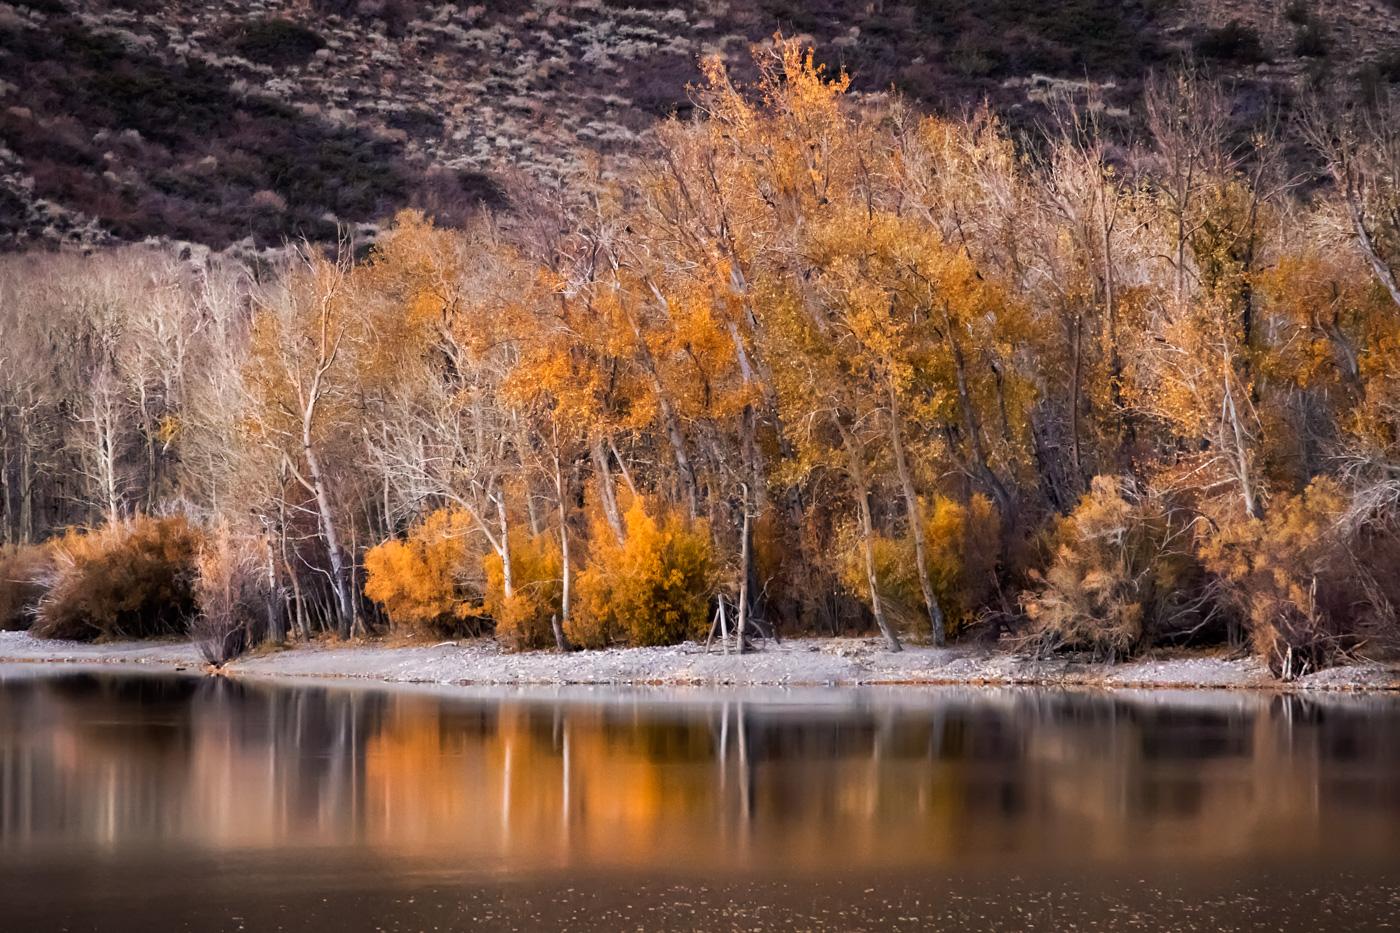 Convict Lake Shore - Eastern Sierra - Aspen - Late Autumn Color